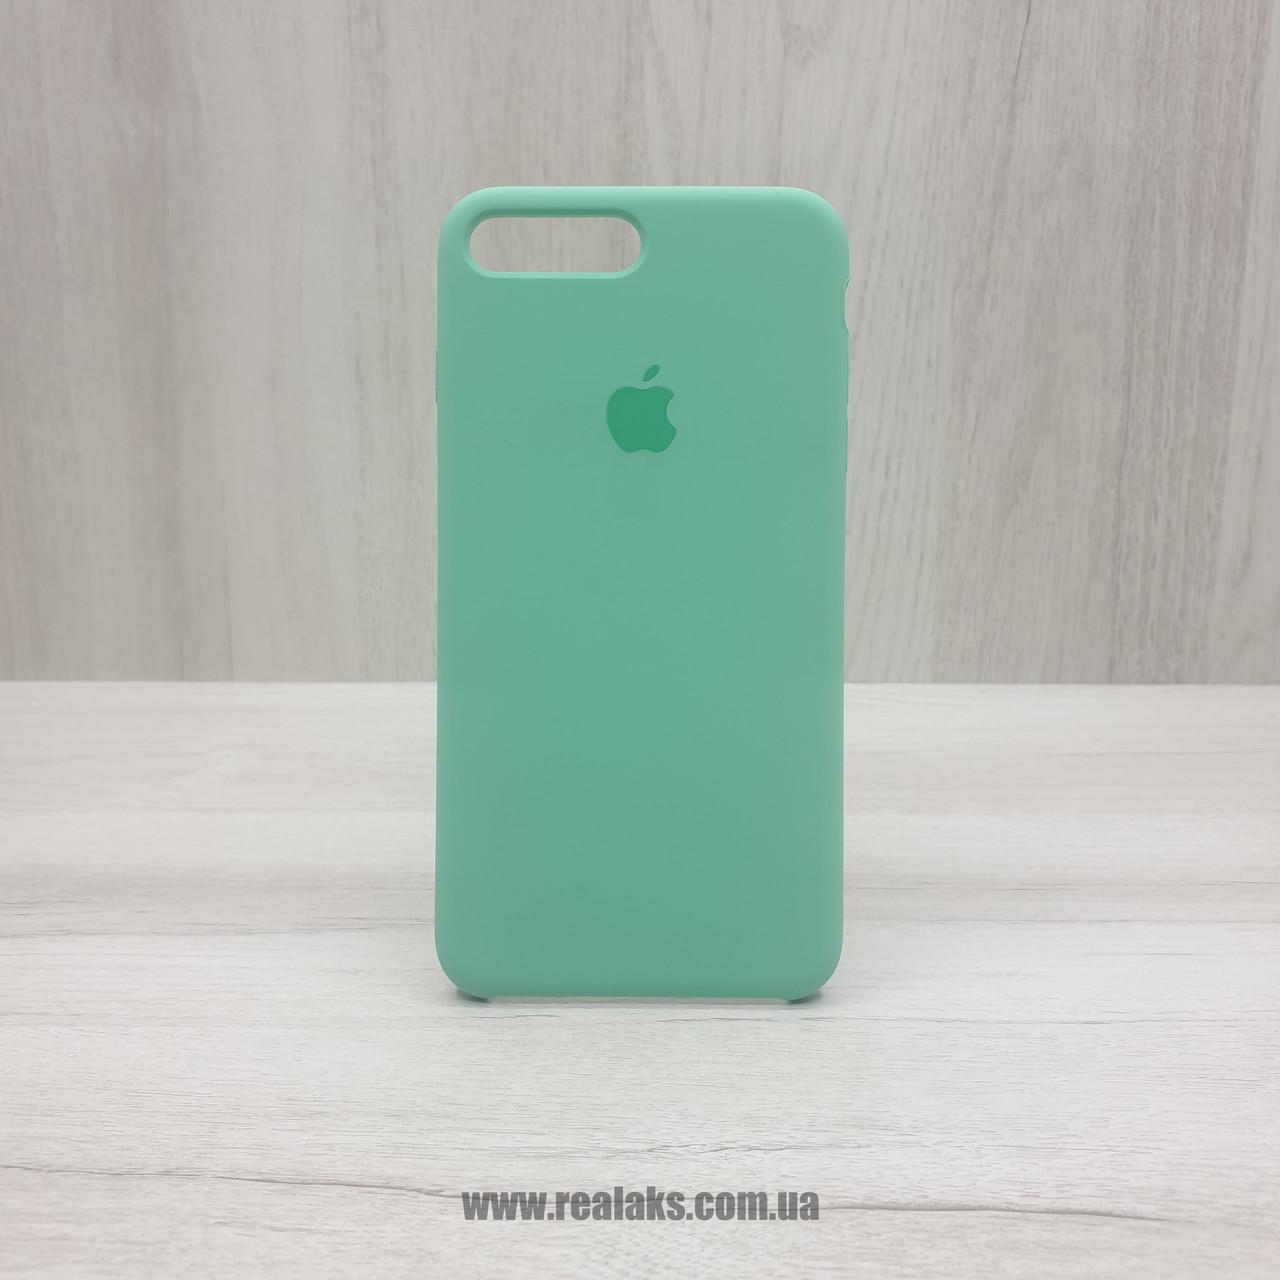 Чехол Silicone Case для Apple iPhone 7/8 Plus spearmint